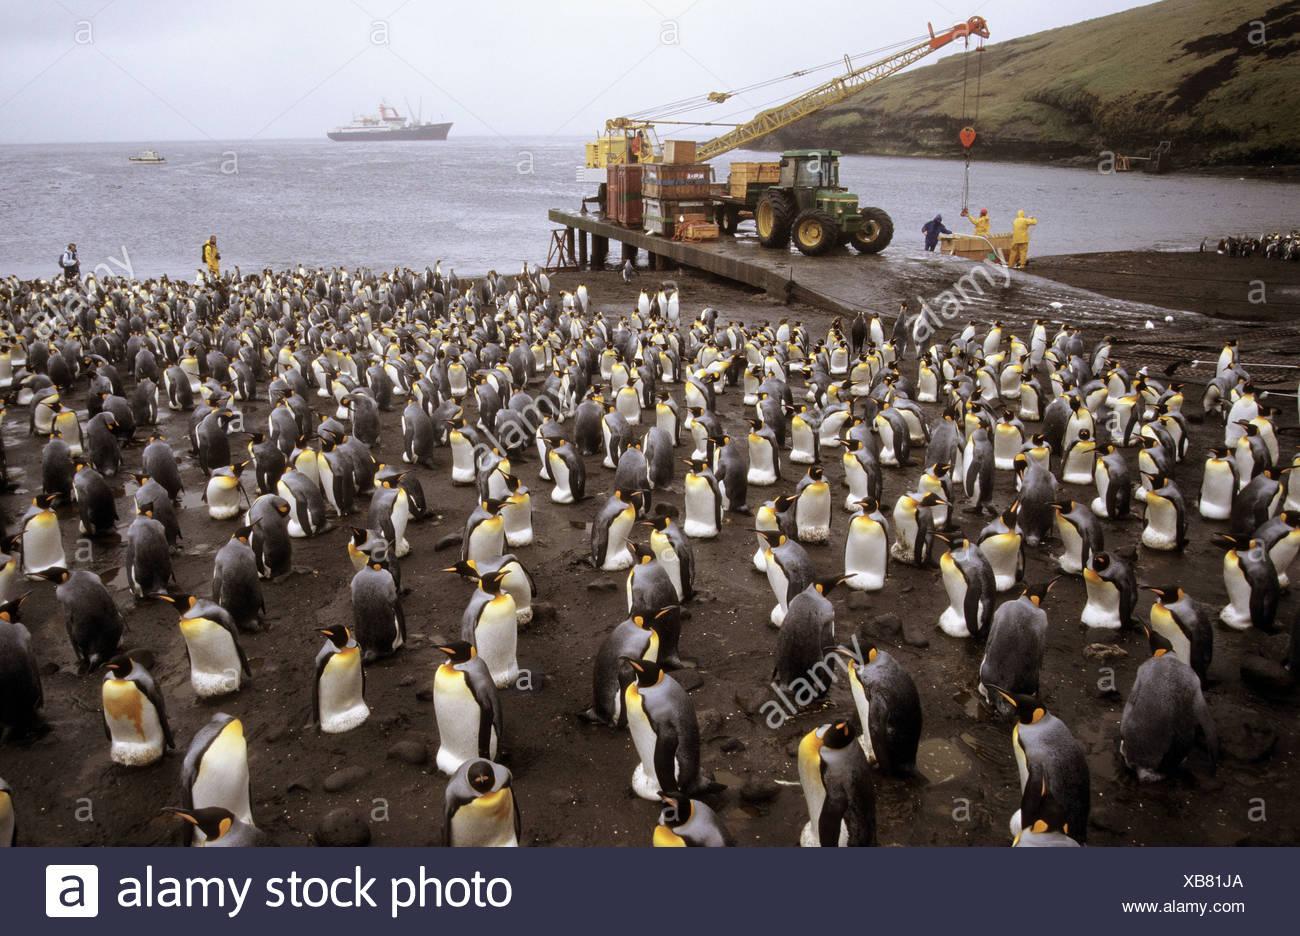 King penguin colony on the wharf of Possession Island (Aptenodytes patagonica), Crozet islands, sub-antarctic - Stock Image